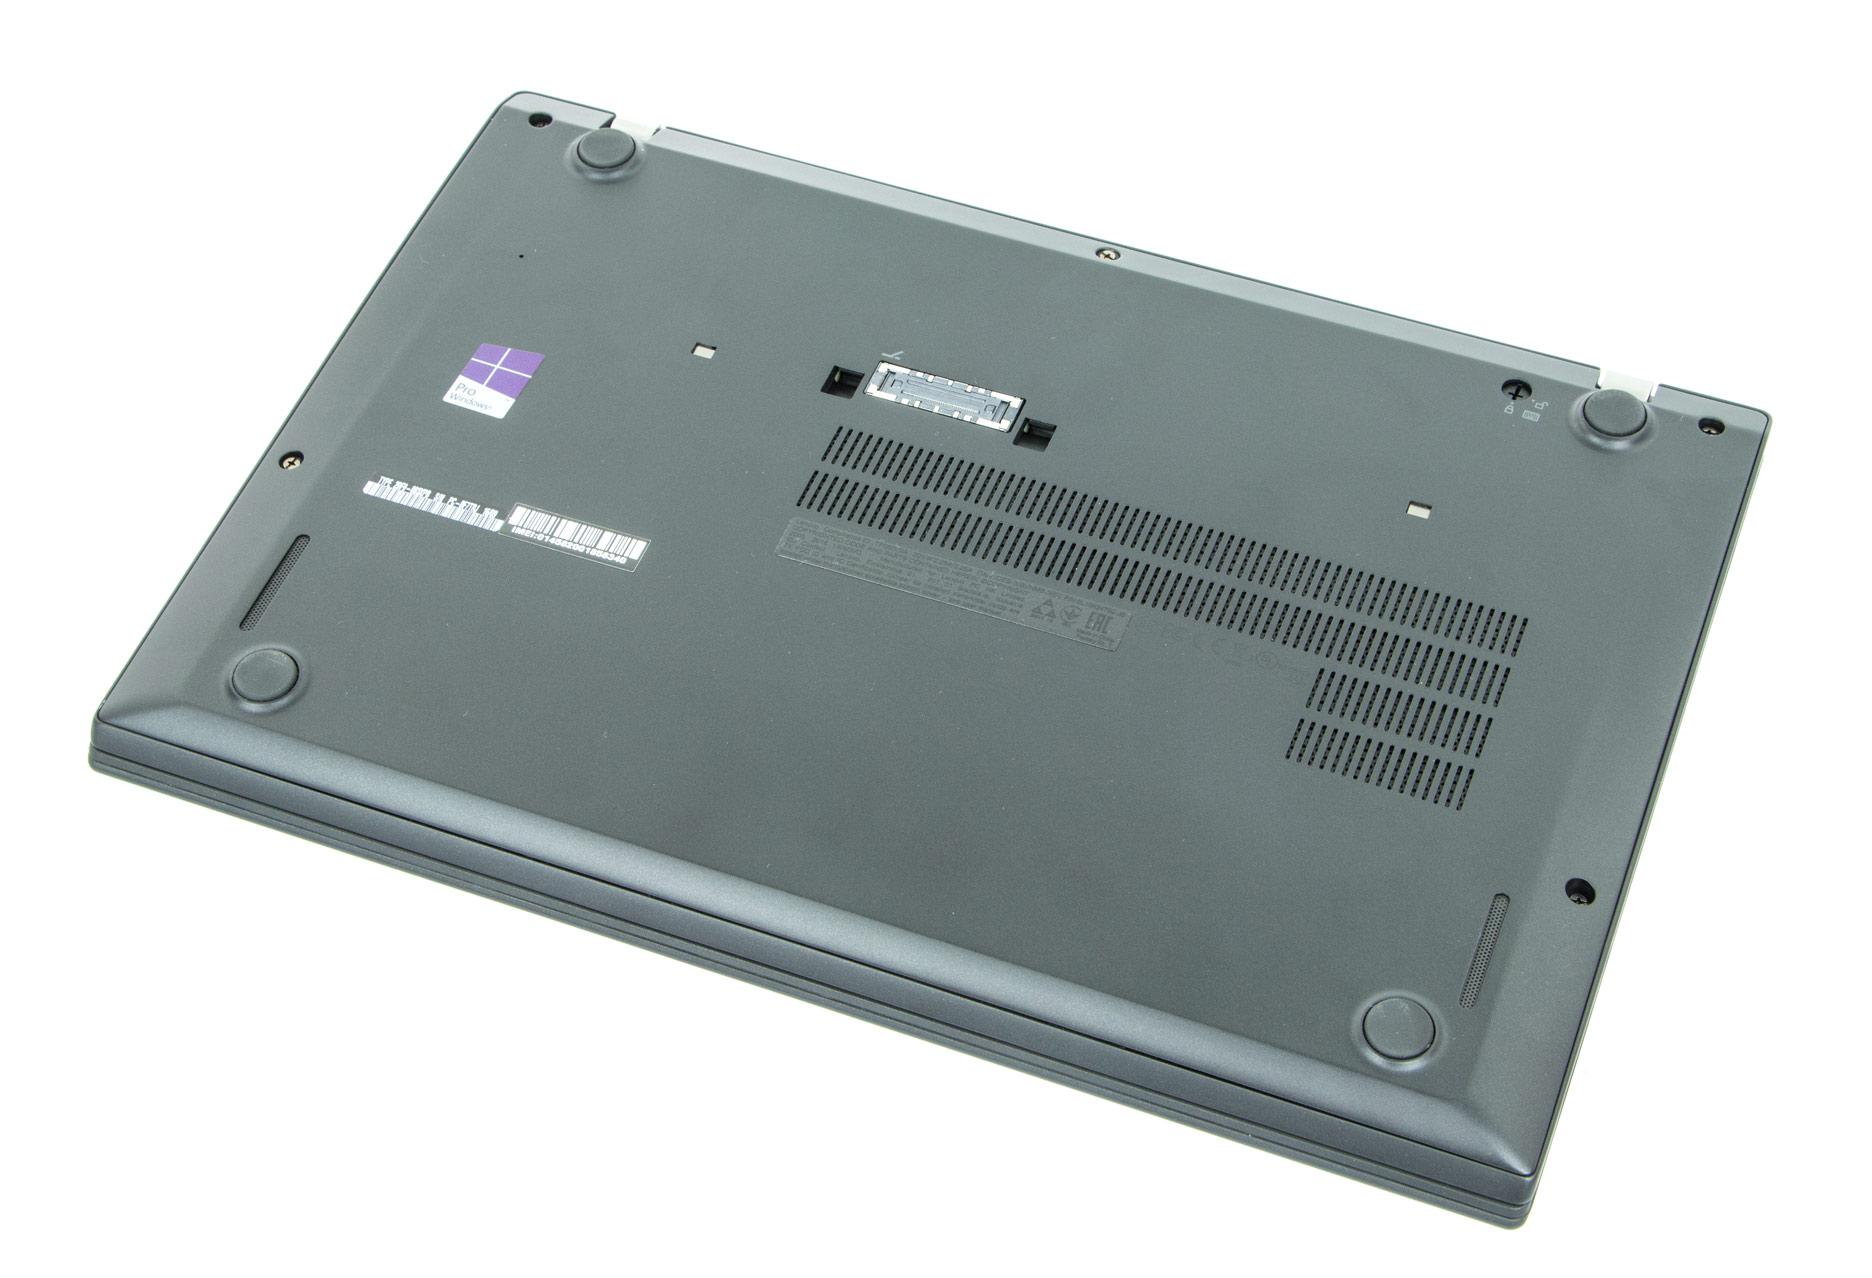 Lenovo ThinkPad T460s spód obudowy